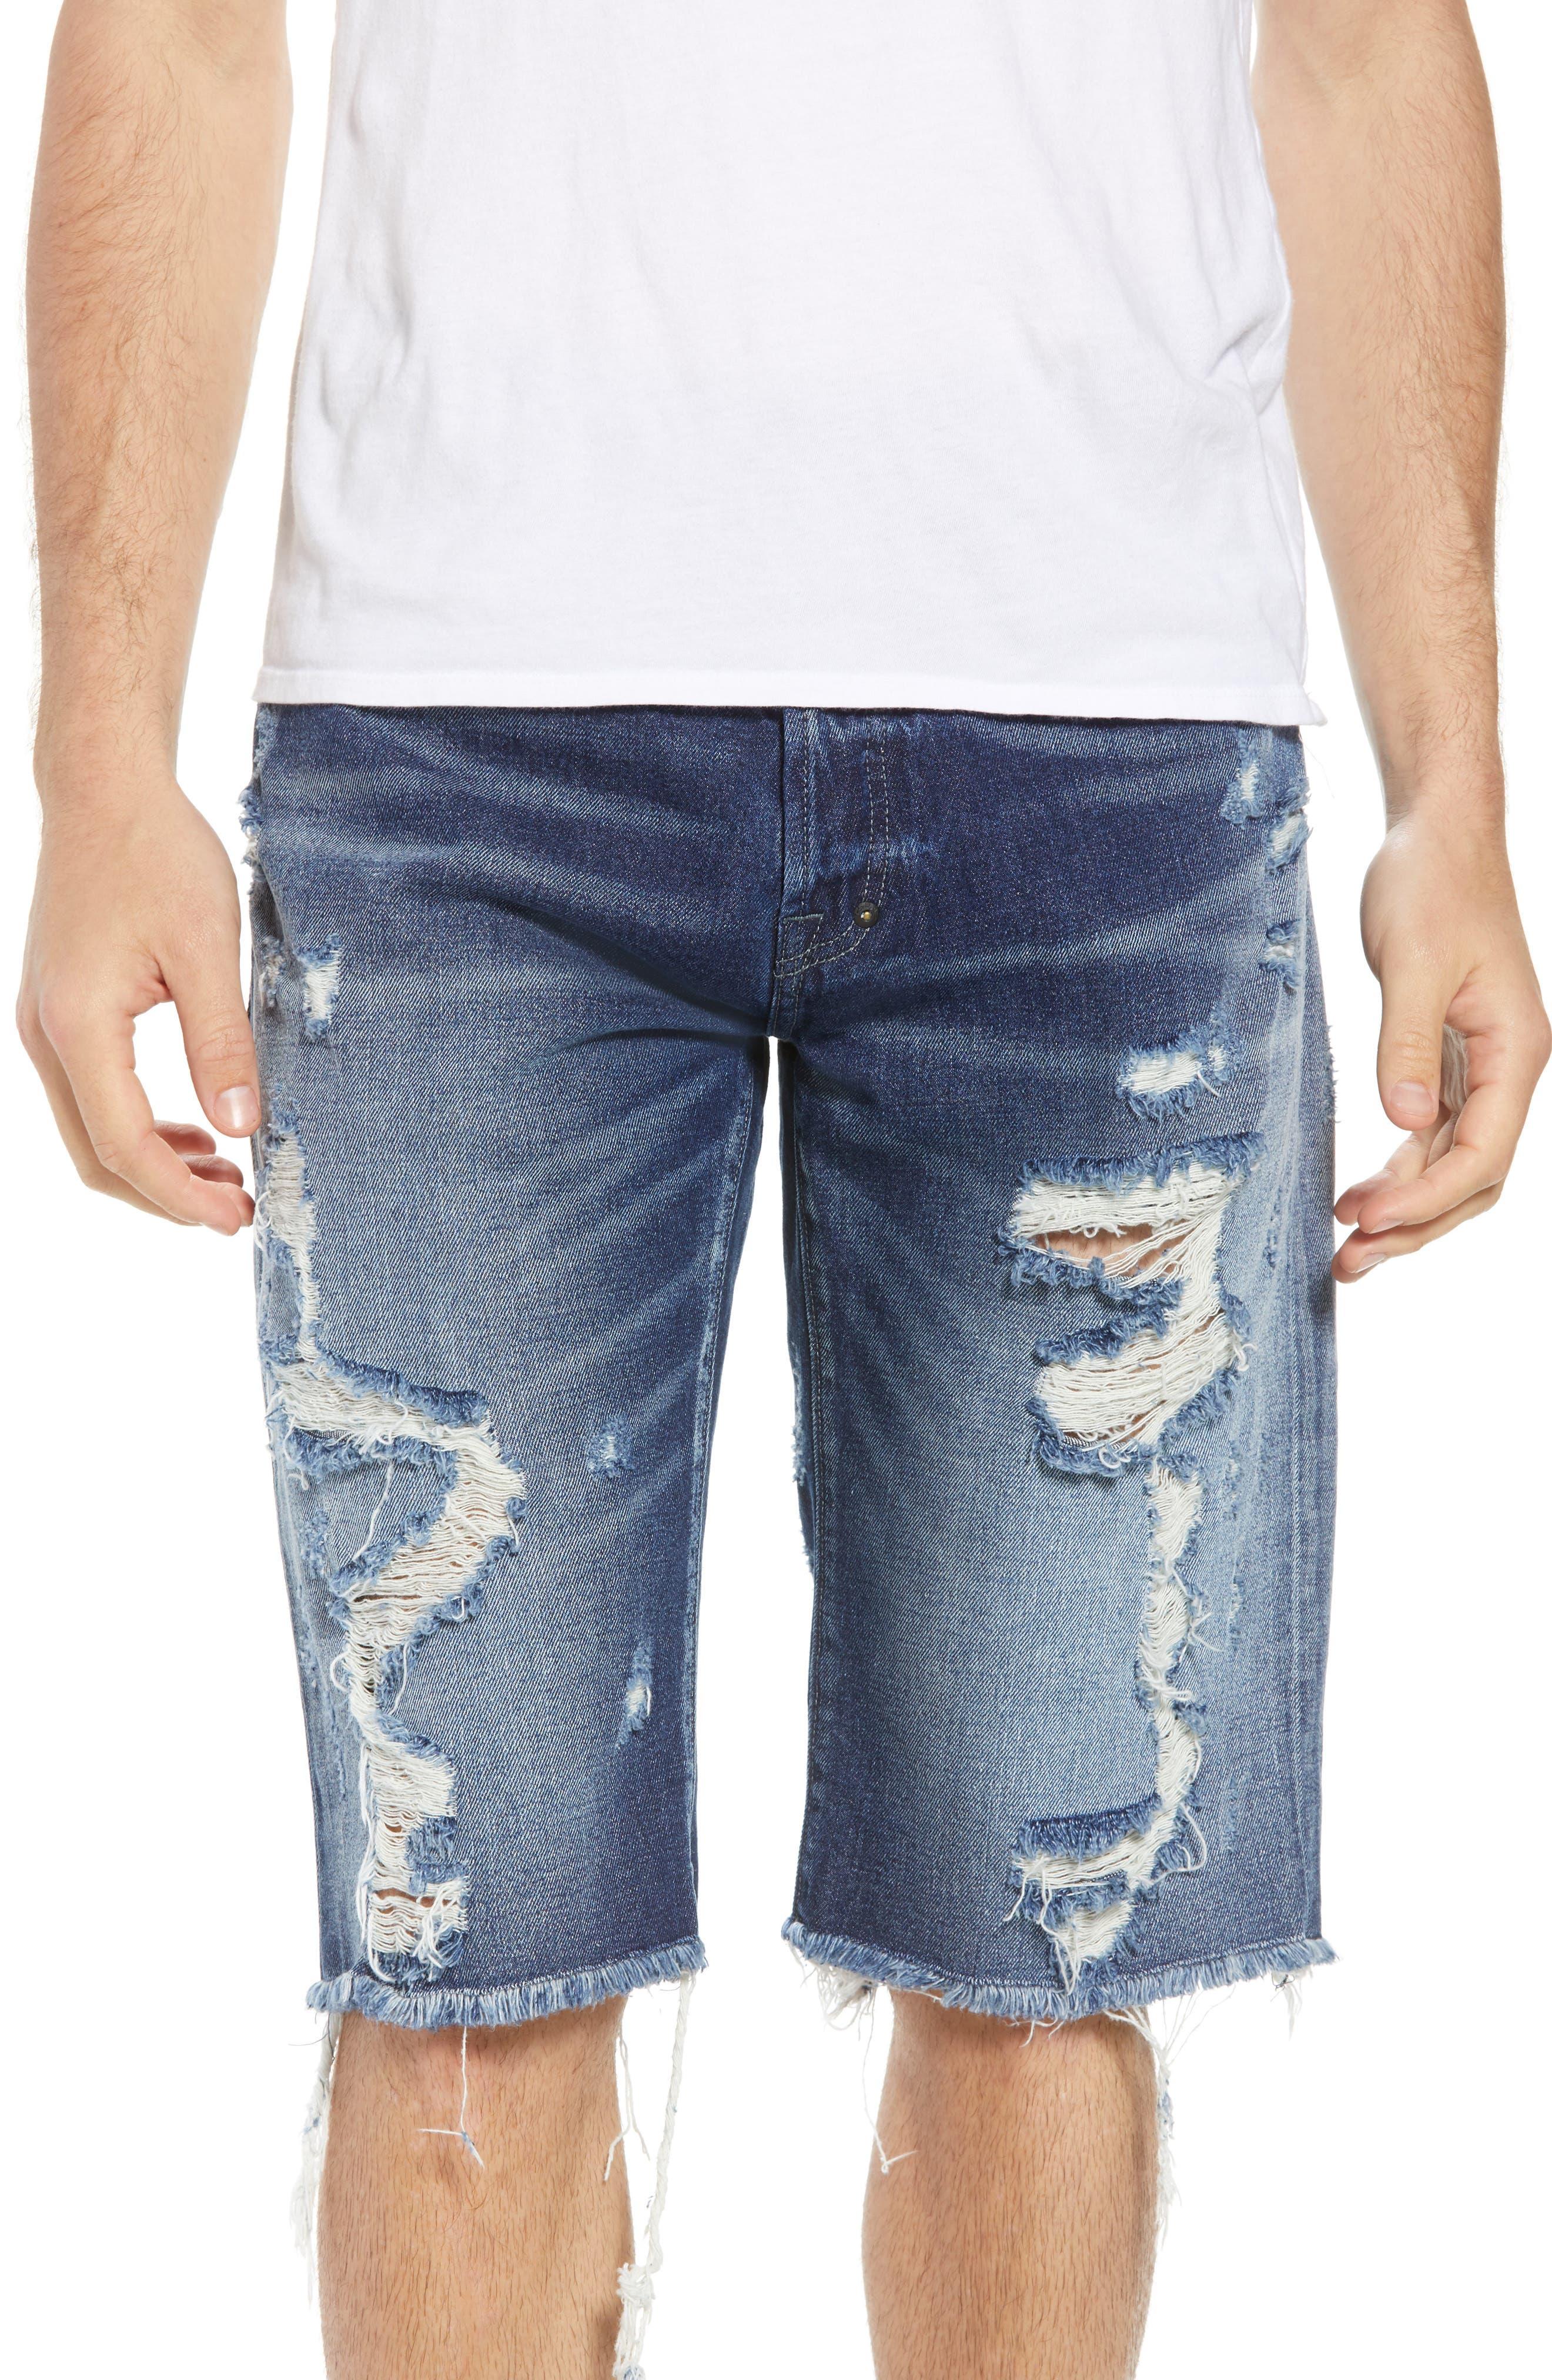 Challenger Regular Fit Shorts,                         Main,                         color, Nimble